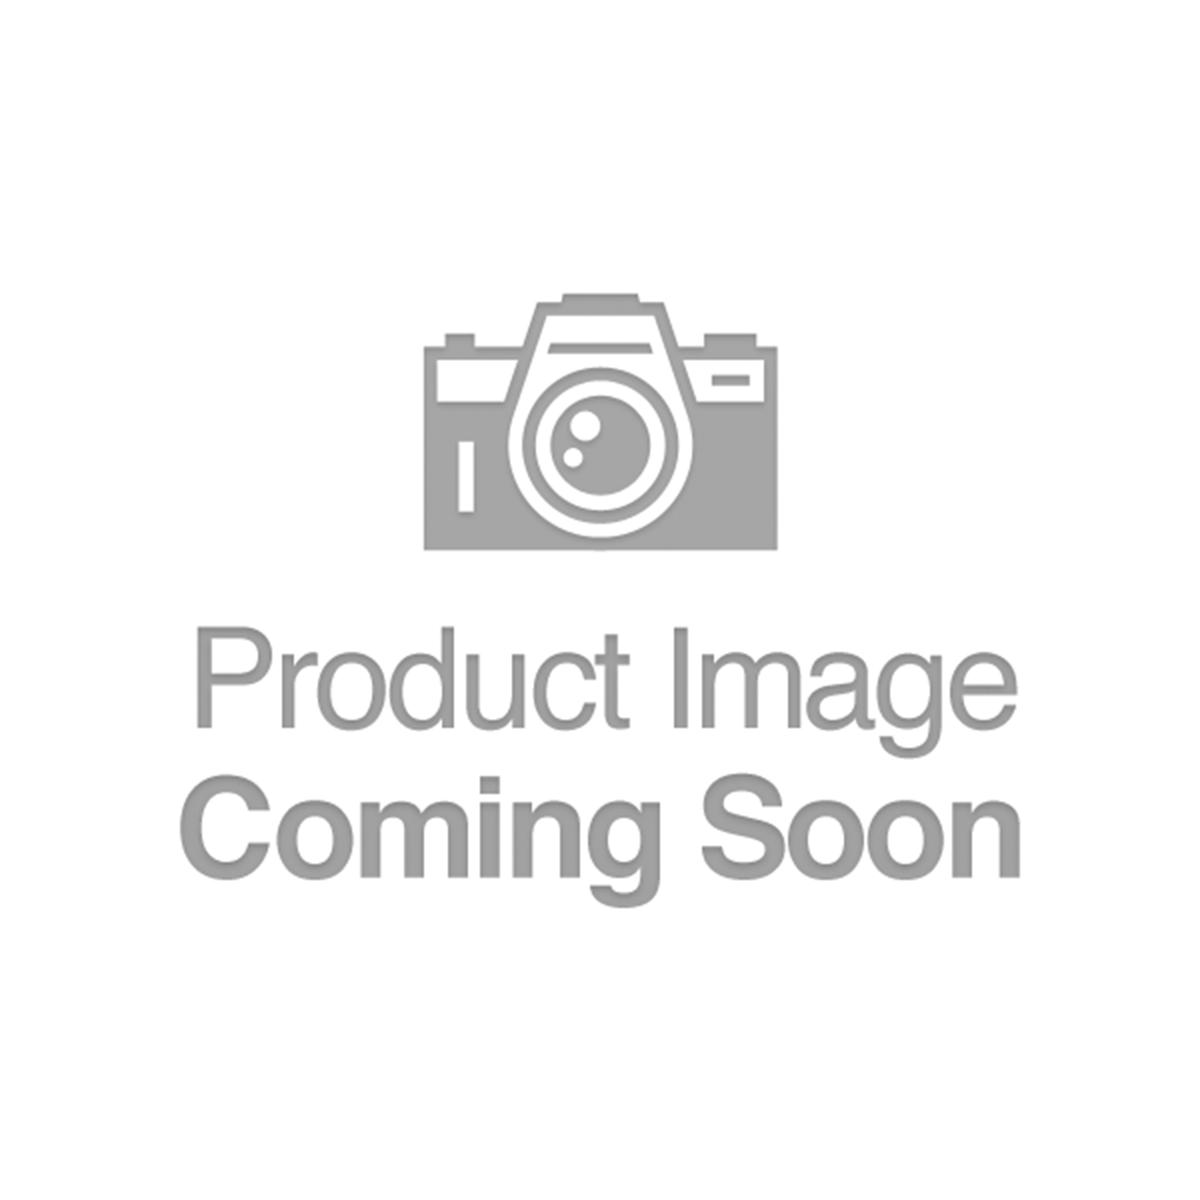 Santa Monica - California - CH 6945 - FR 624 - PMG 25